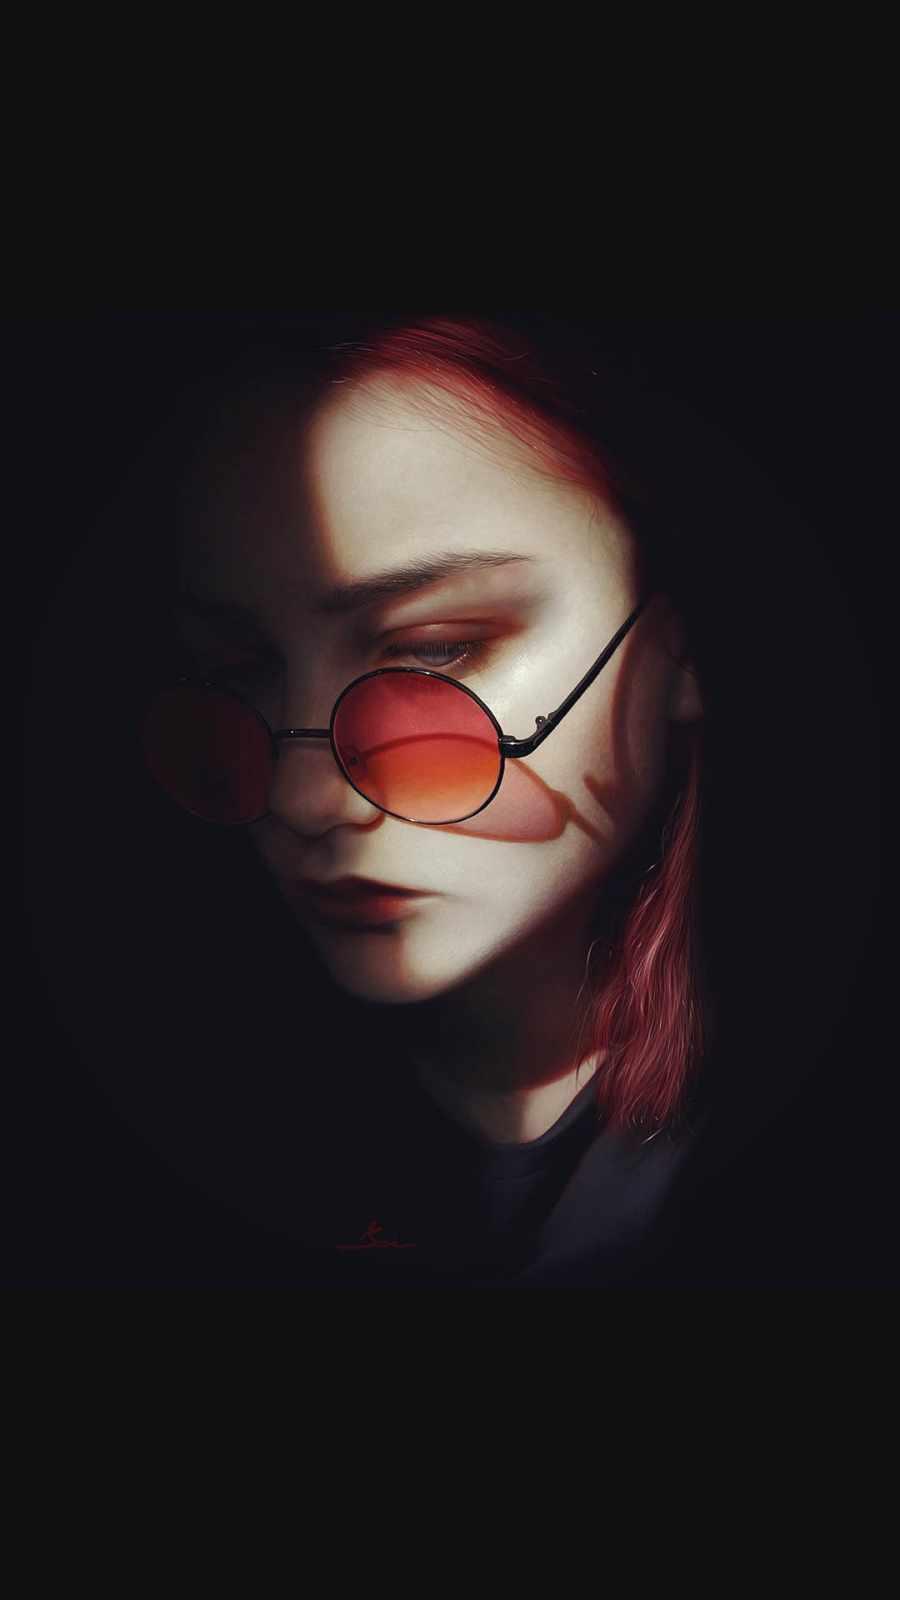 Girl in Dark iPhone Wallpaper